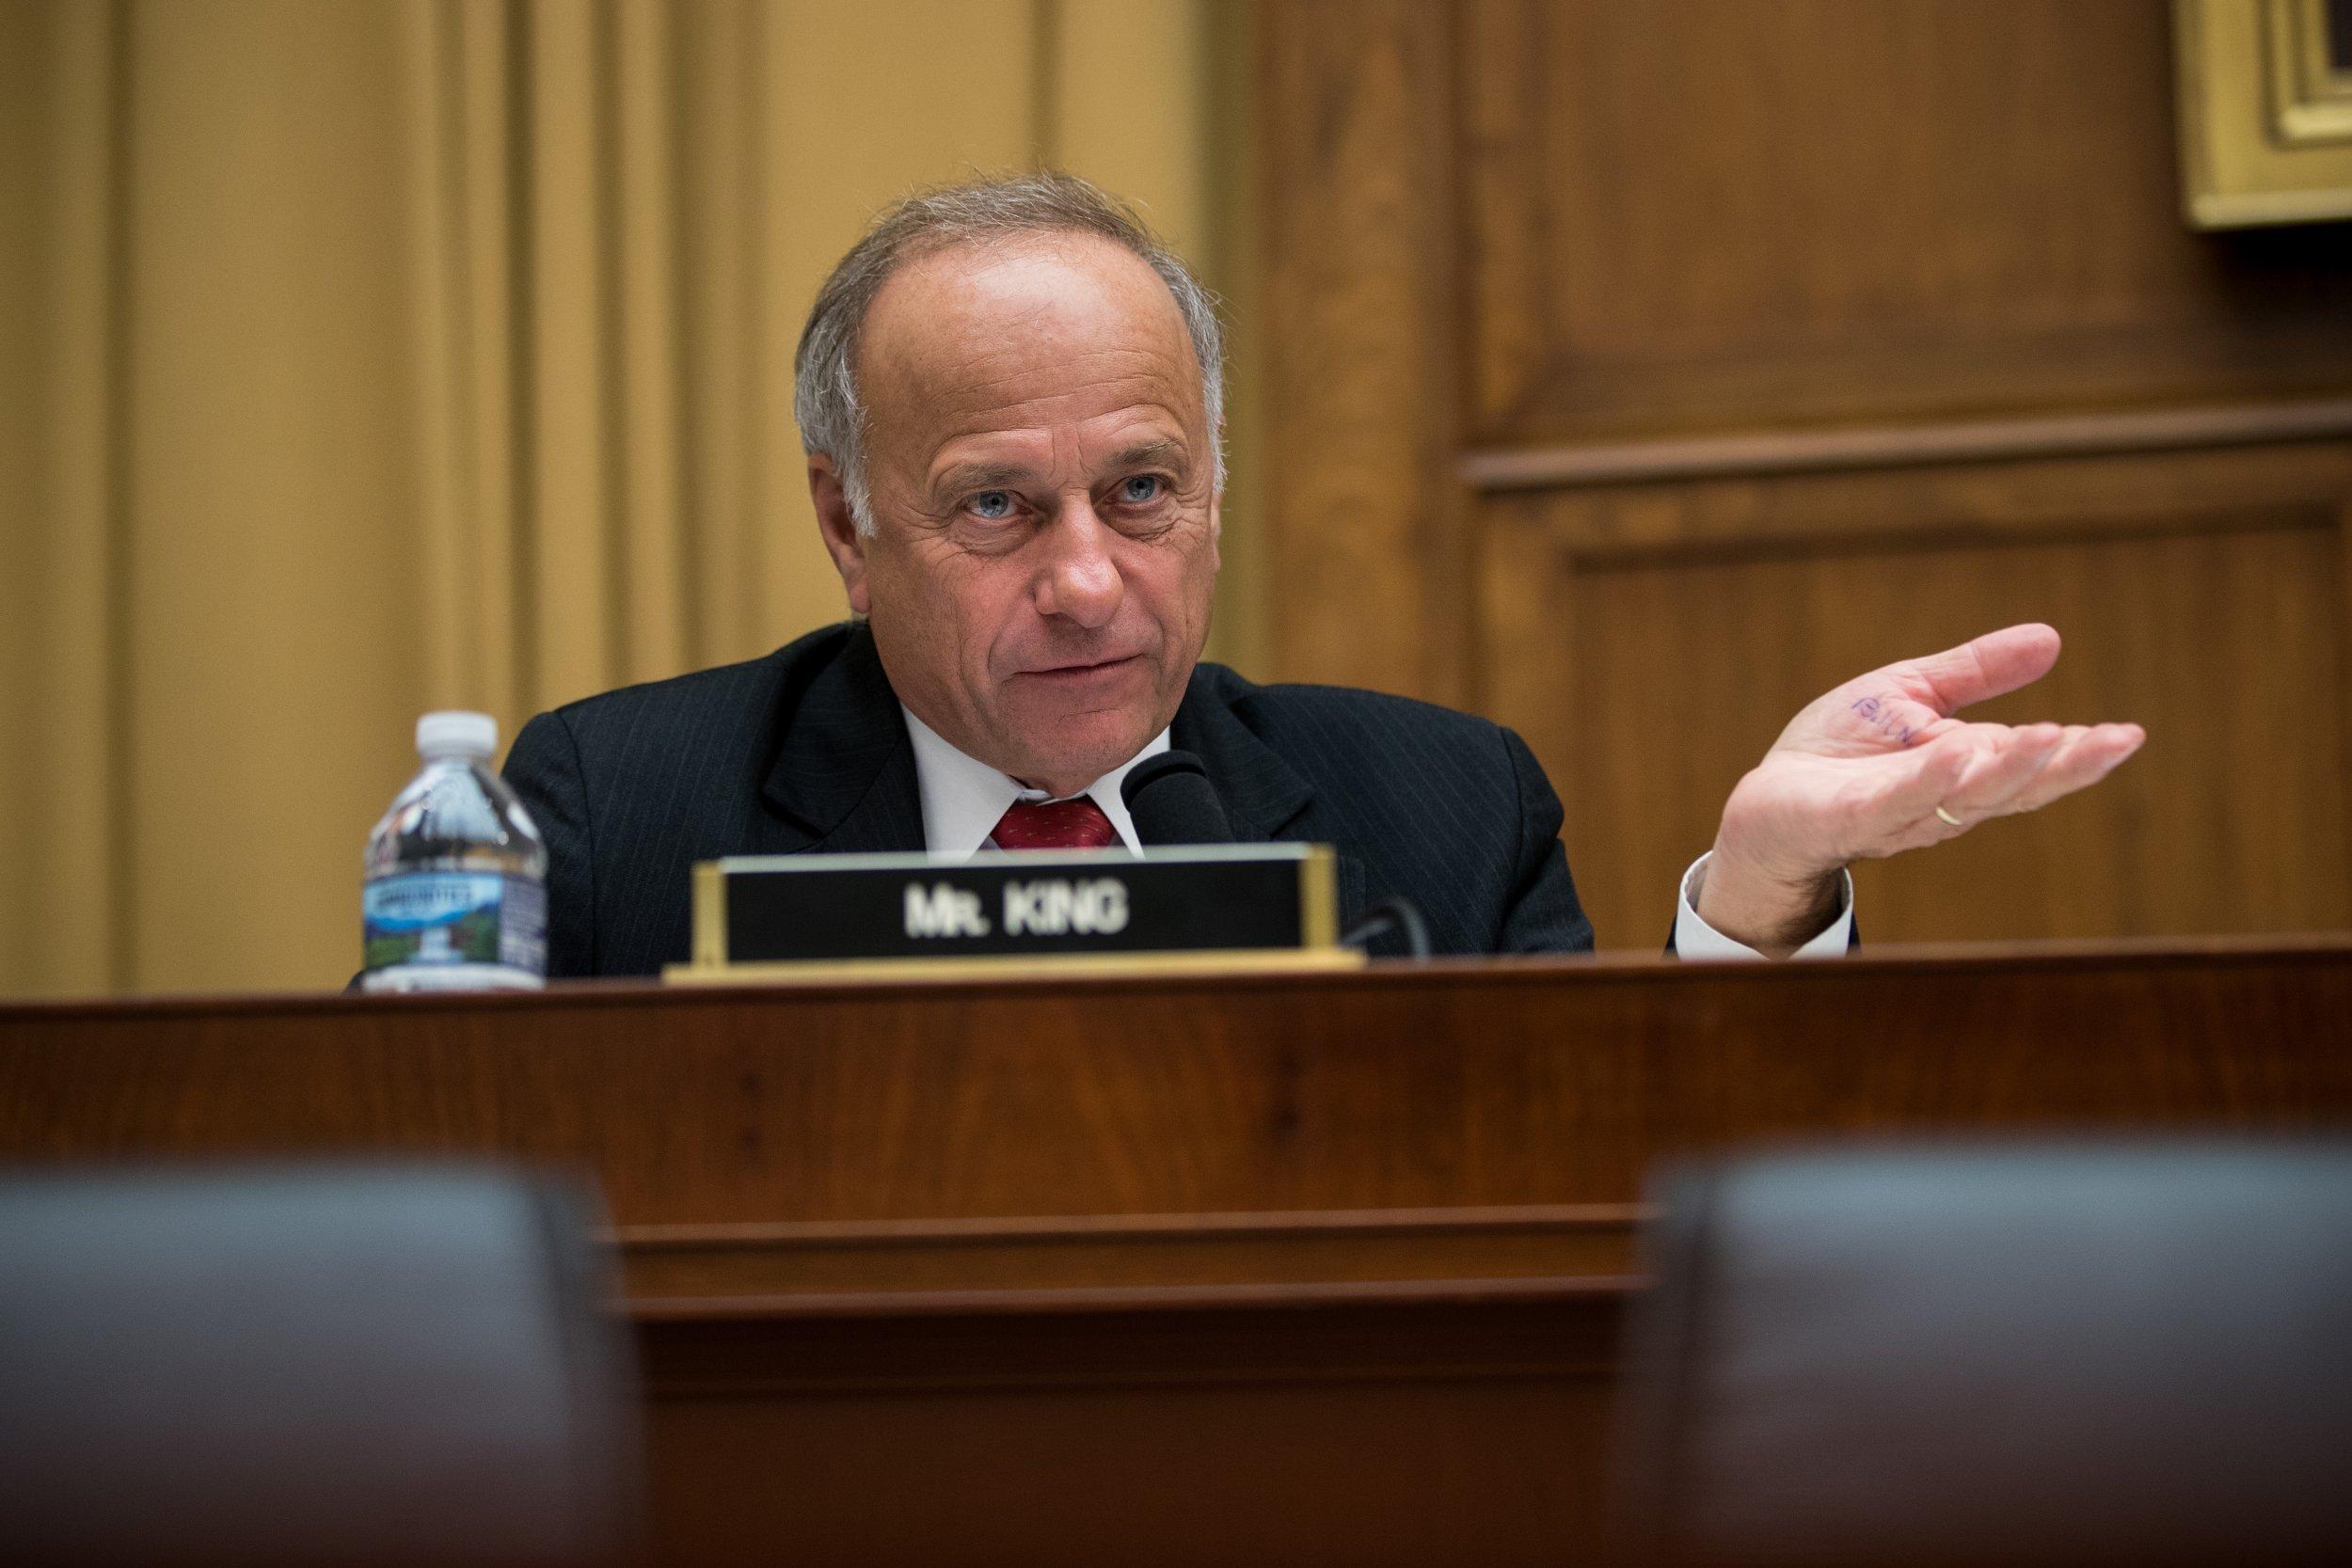 steve king, white nationalist, congressional black caucus